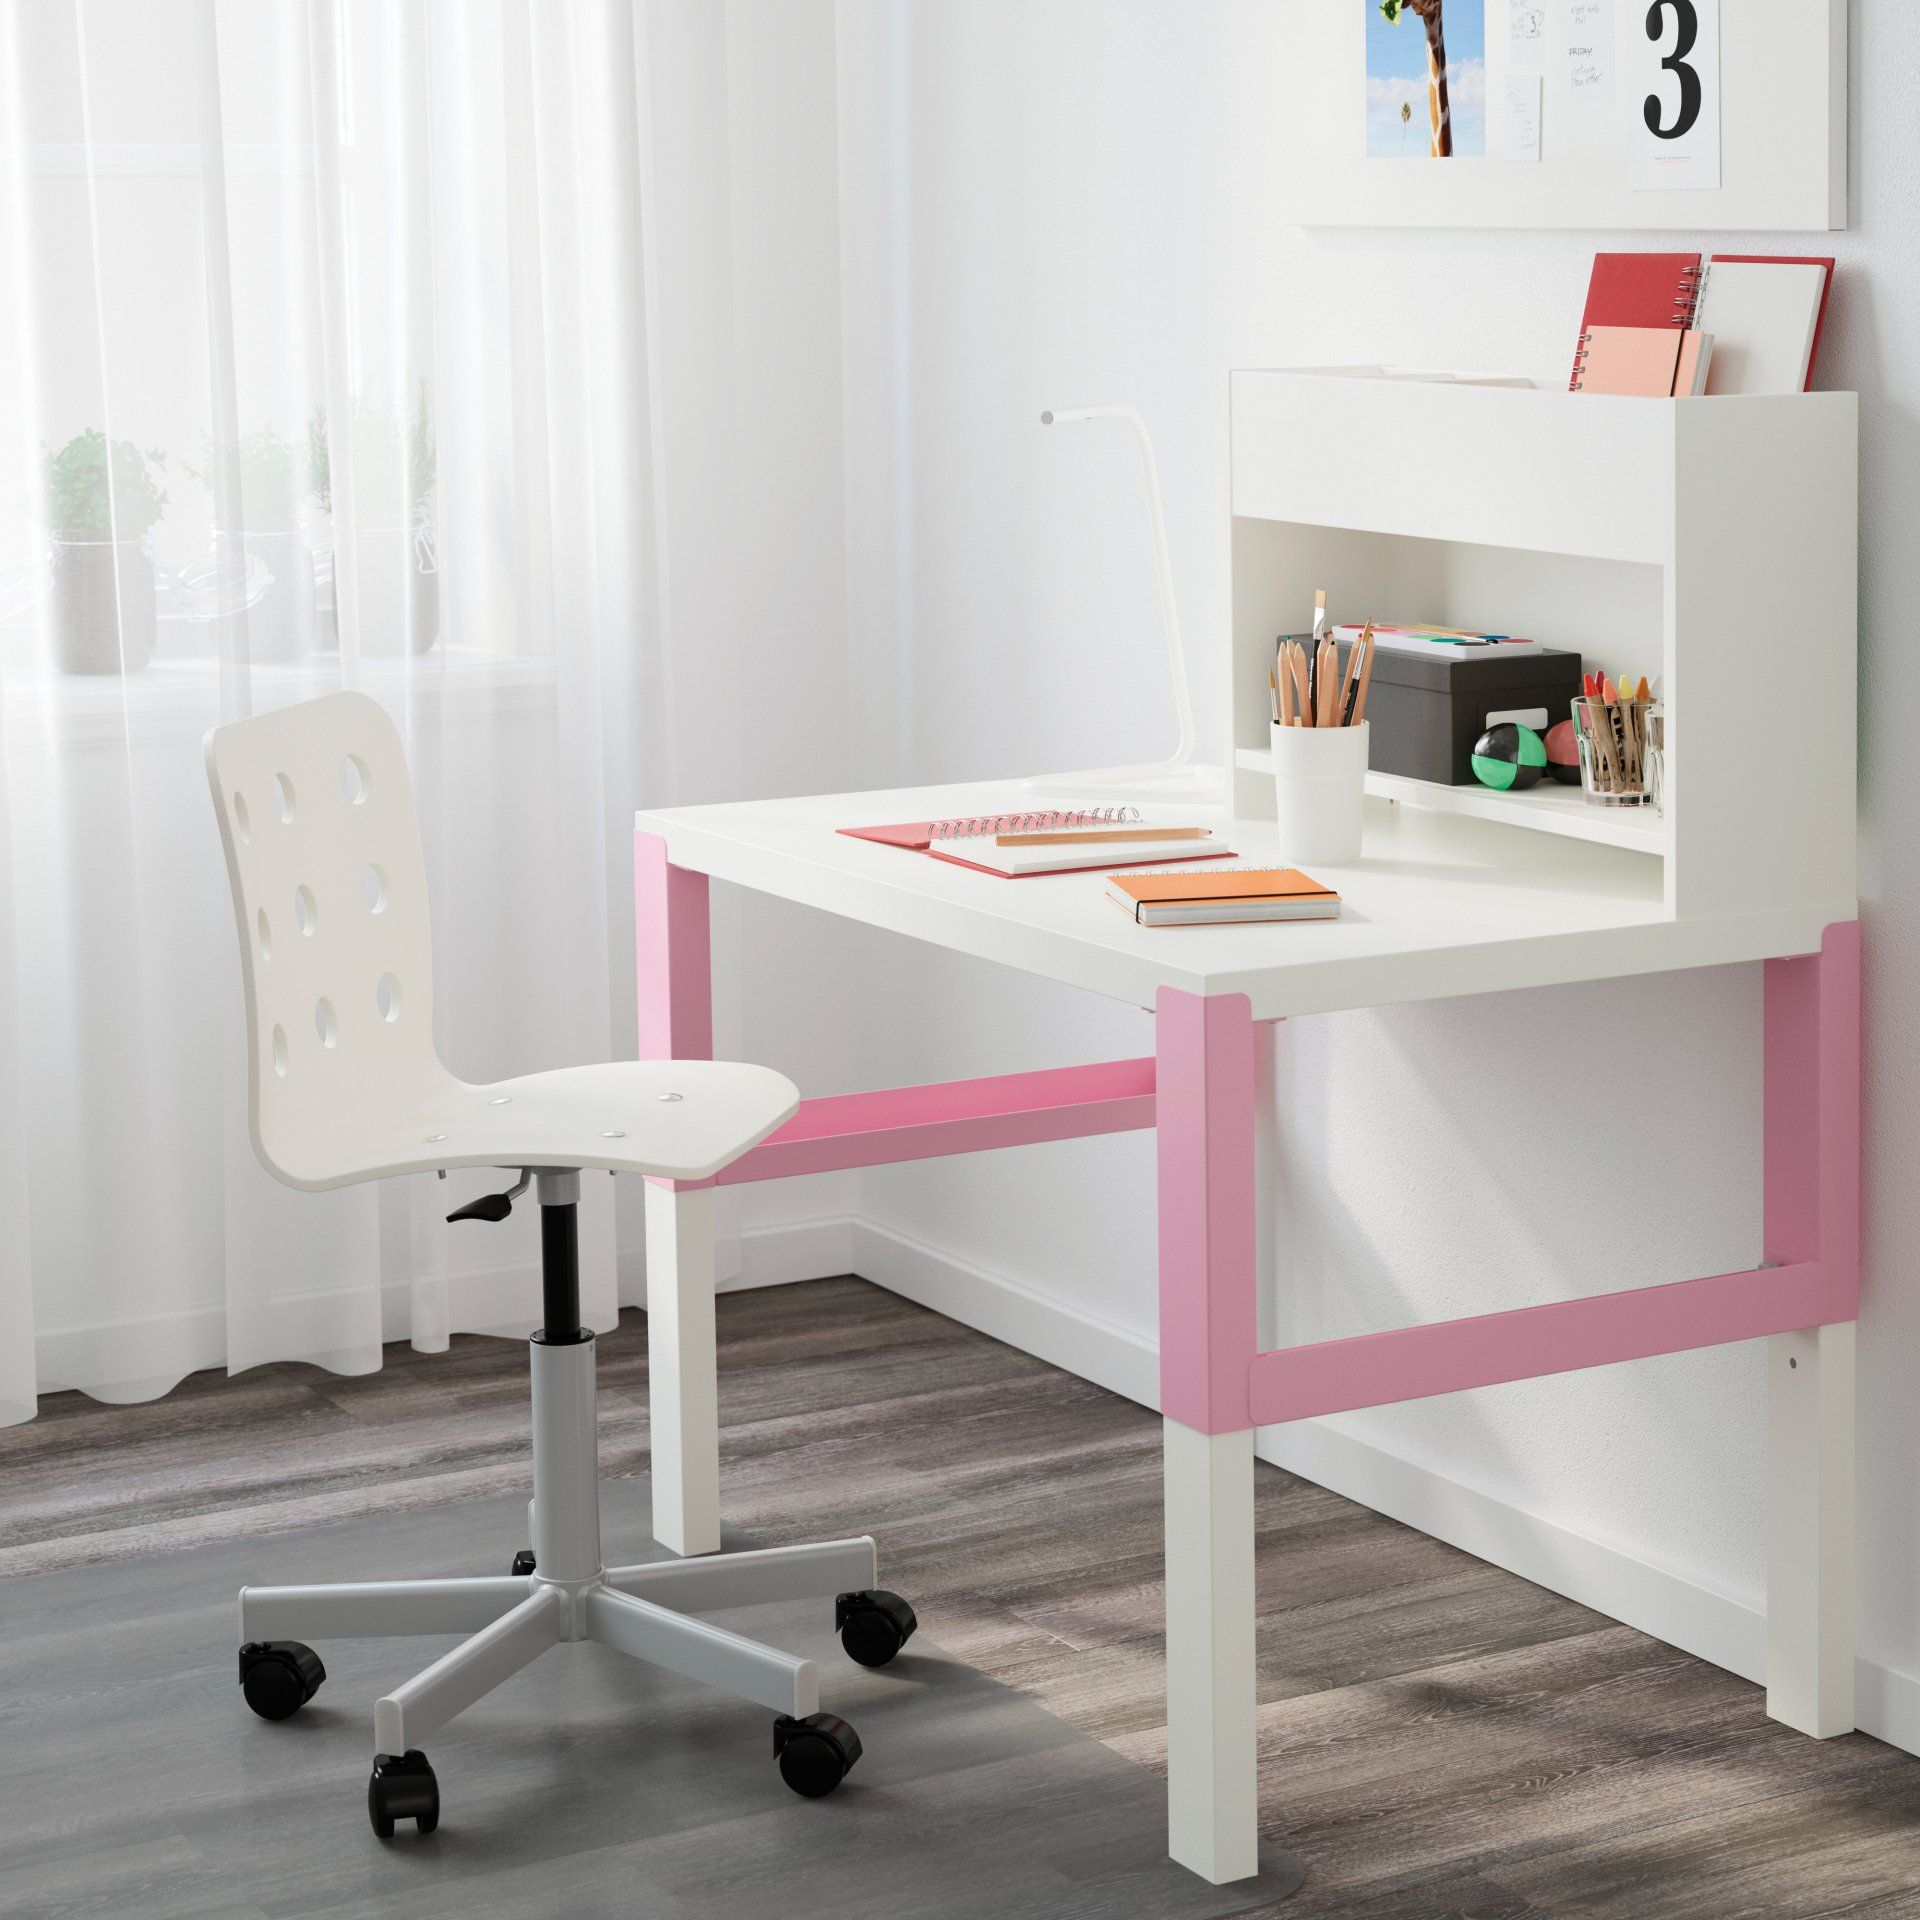 Bureau Special Primaire Petite Fee Blanc Violet Vertbaudet